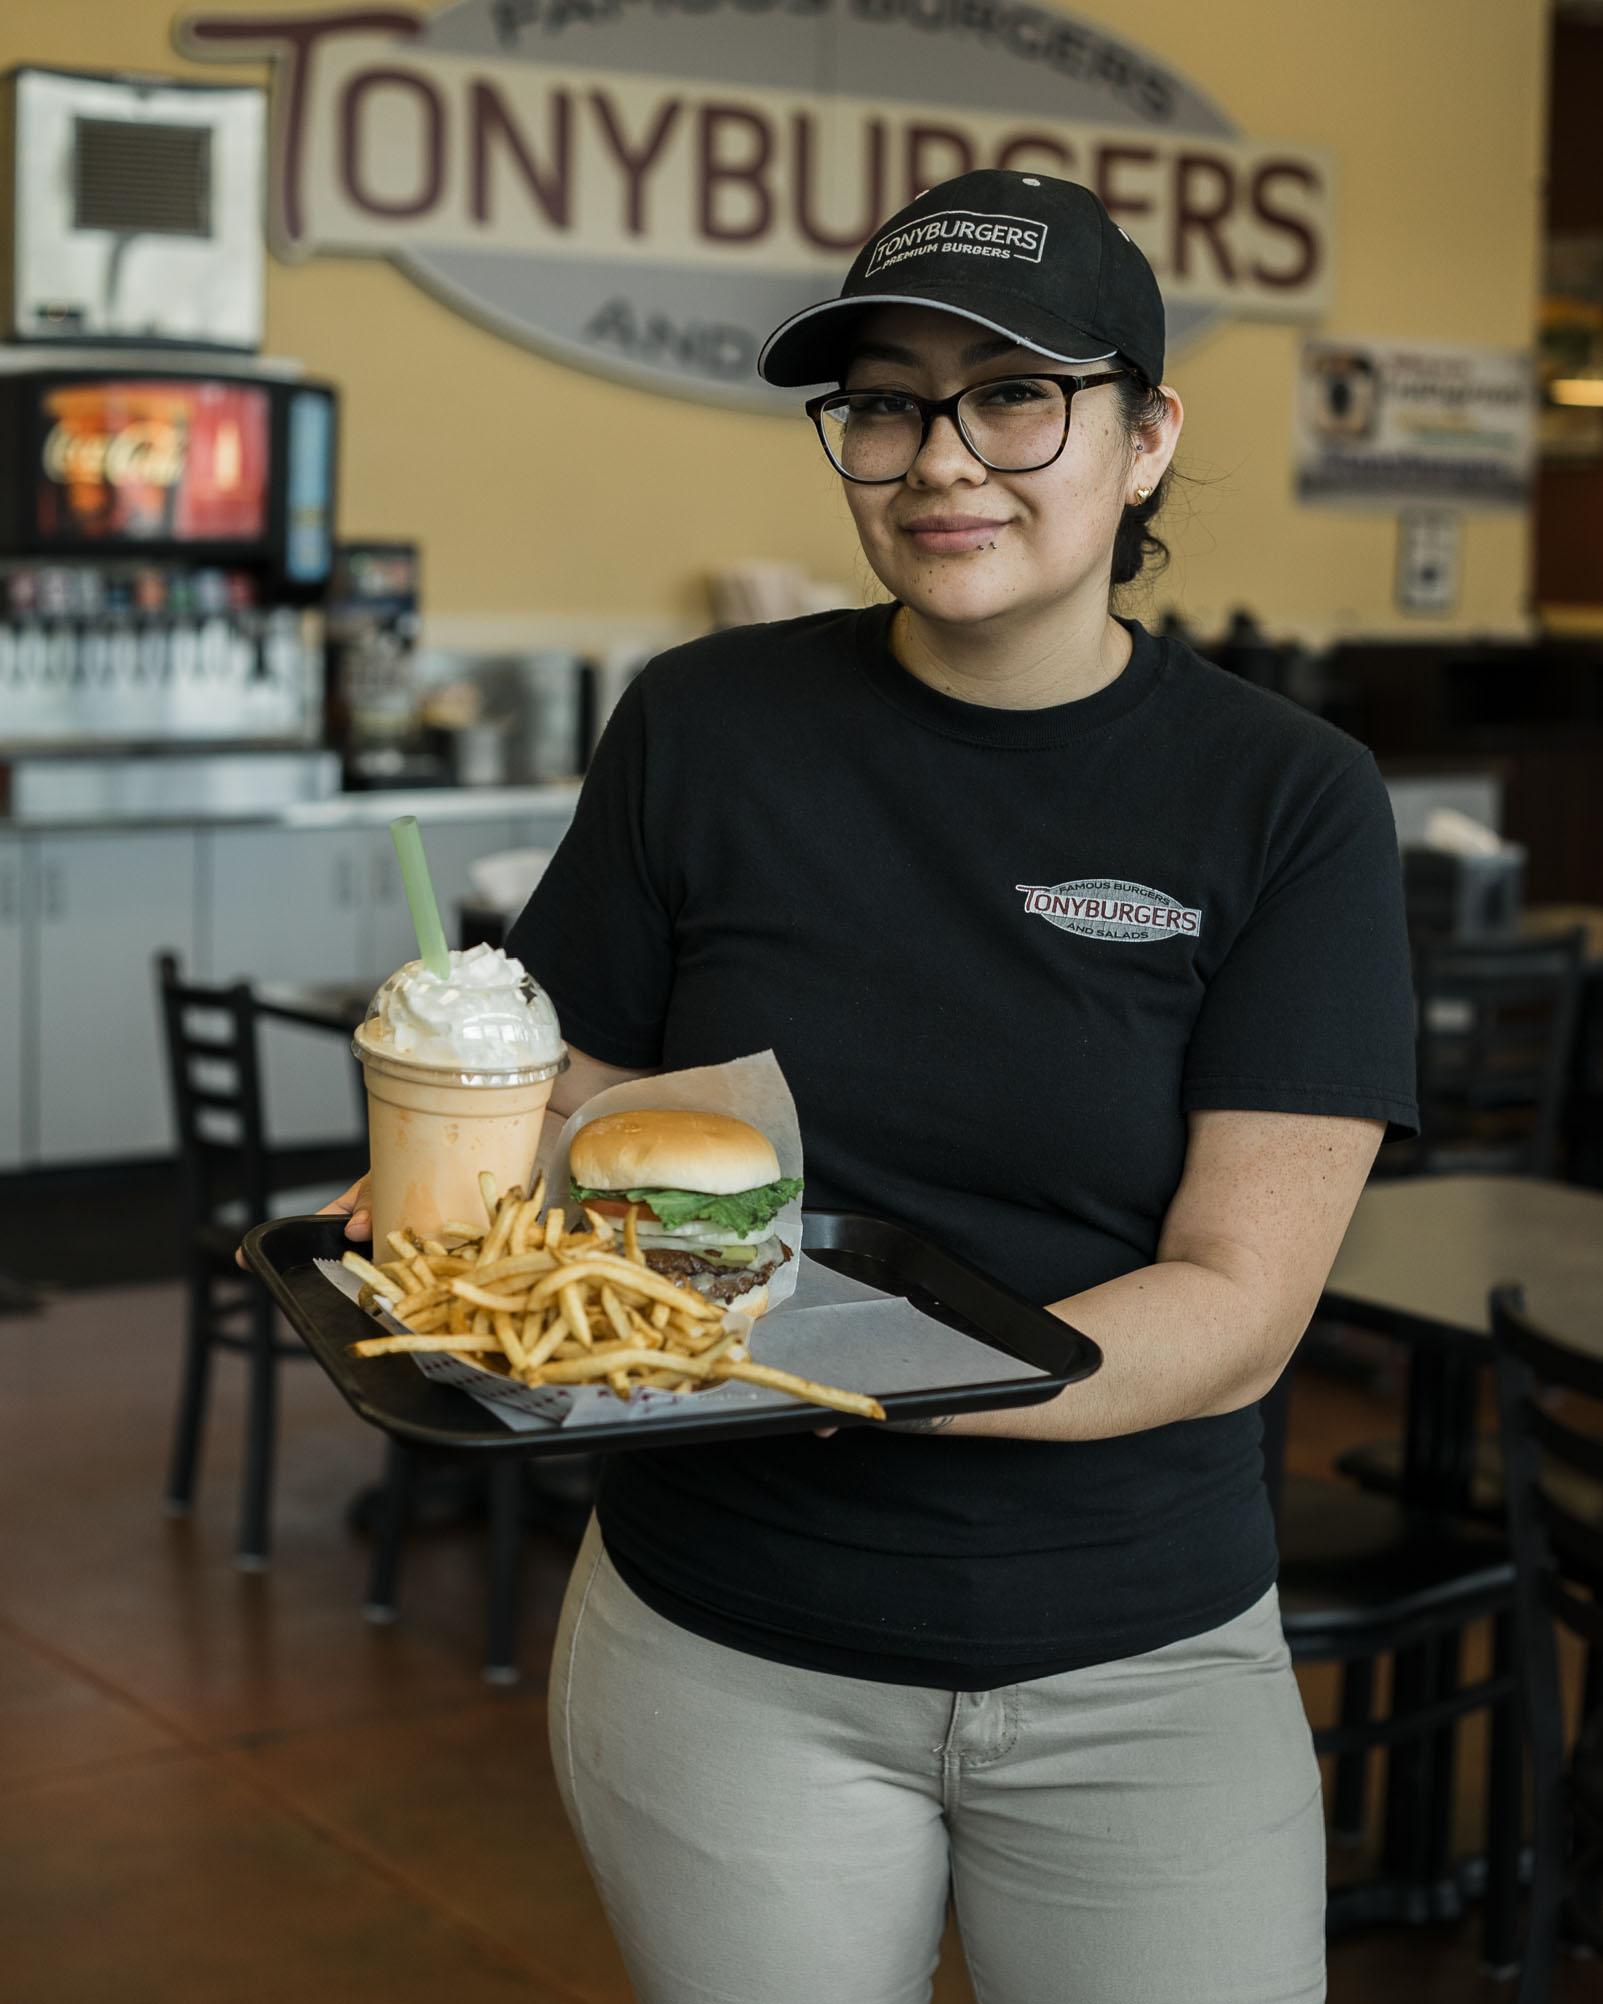 tonyburgers-big-american-story-00832.jpg